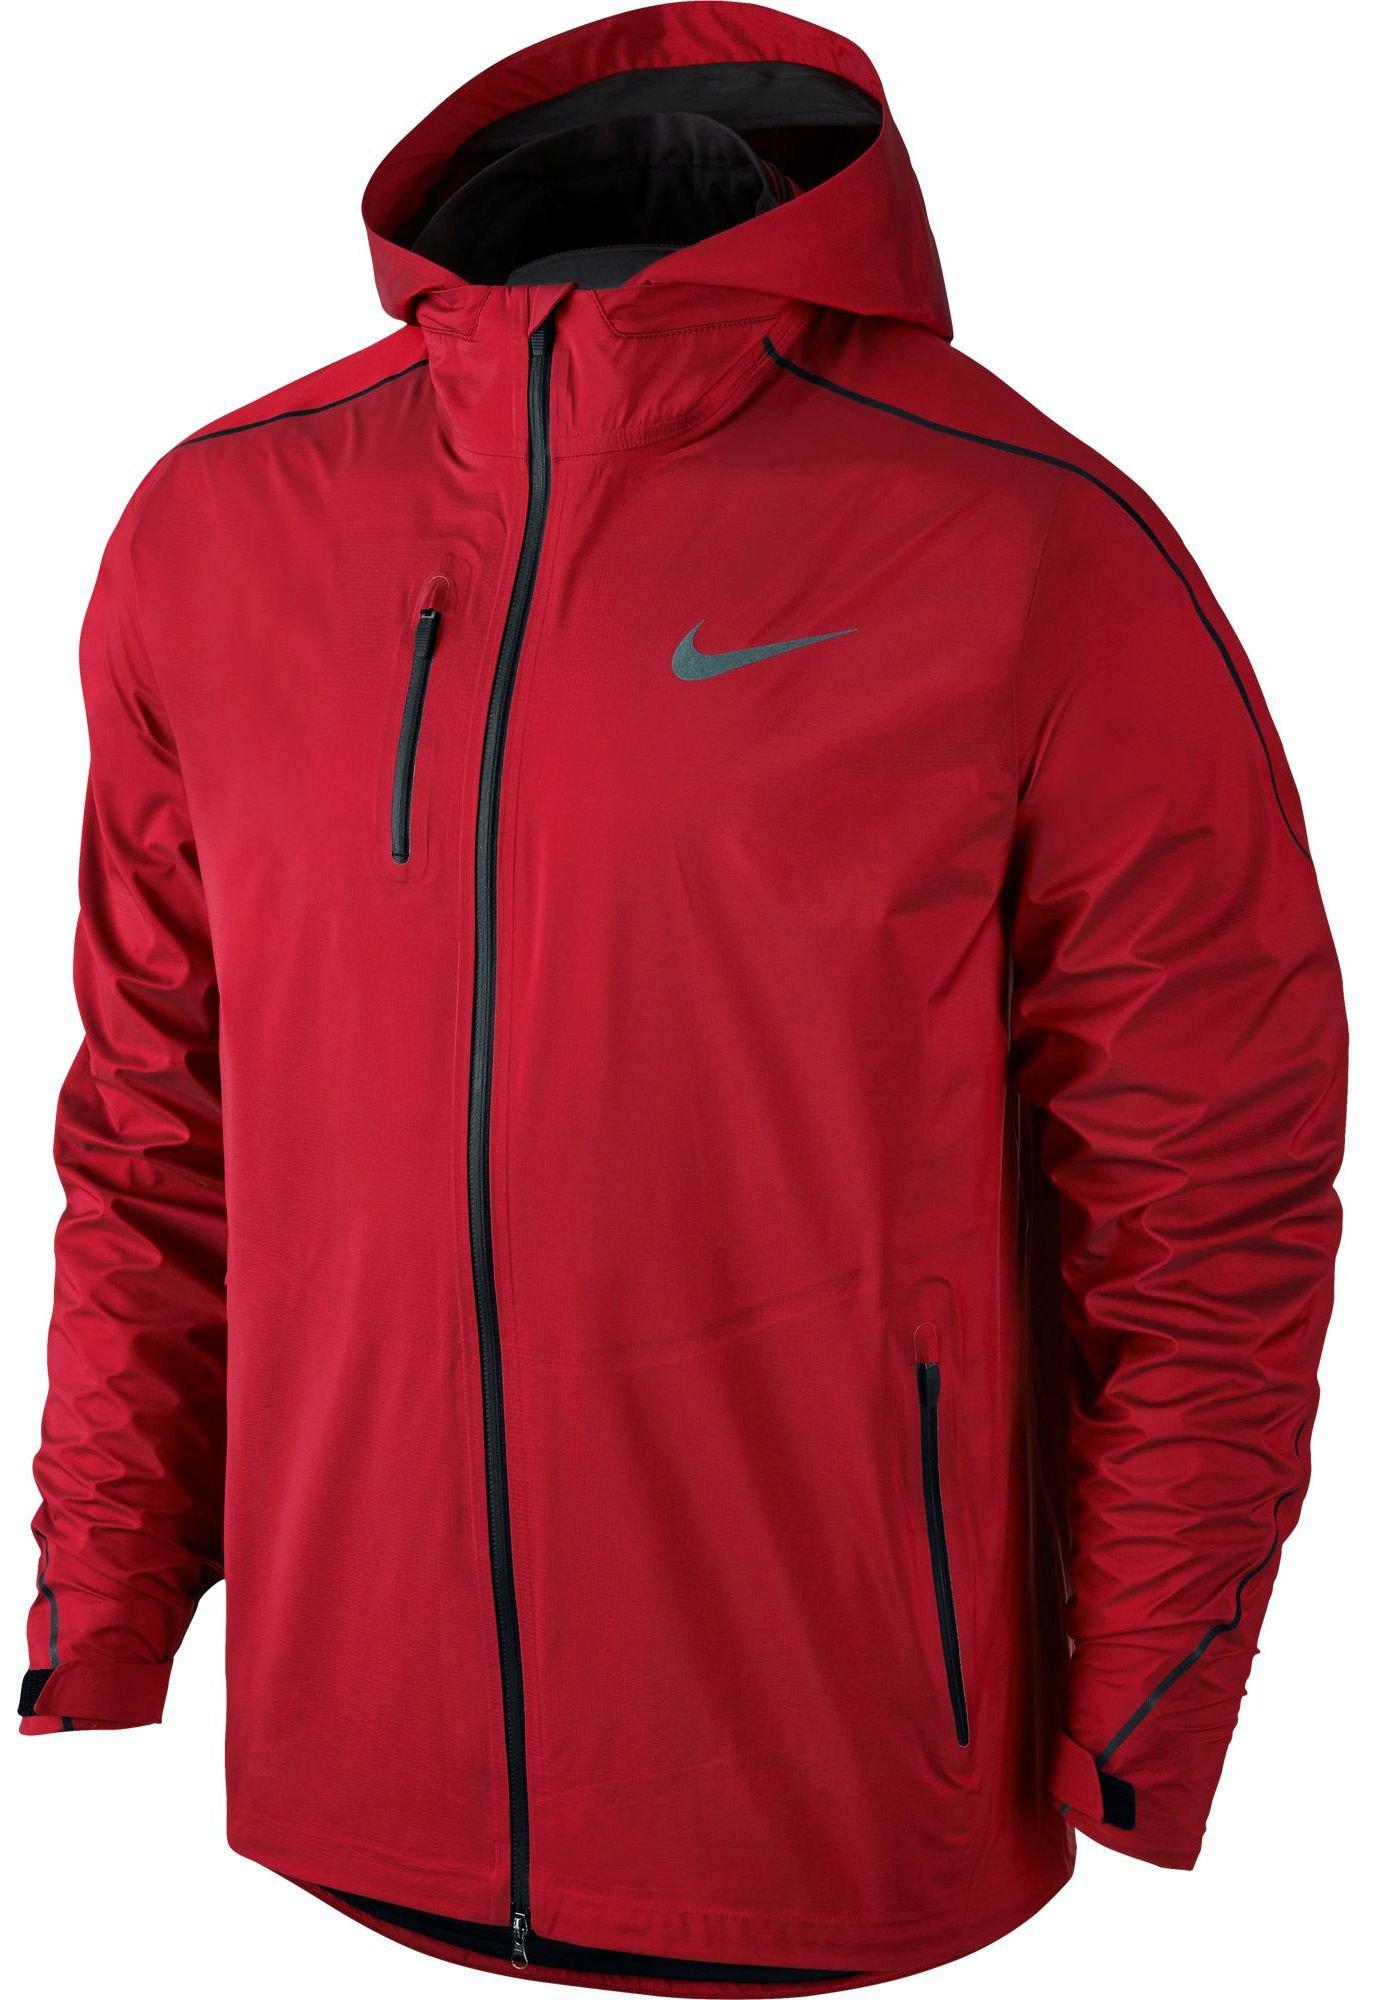 066530f9 Купить куртку Nike HyperShield Running Jacket 800901 657 | Интернет ...